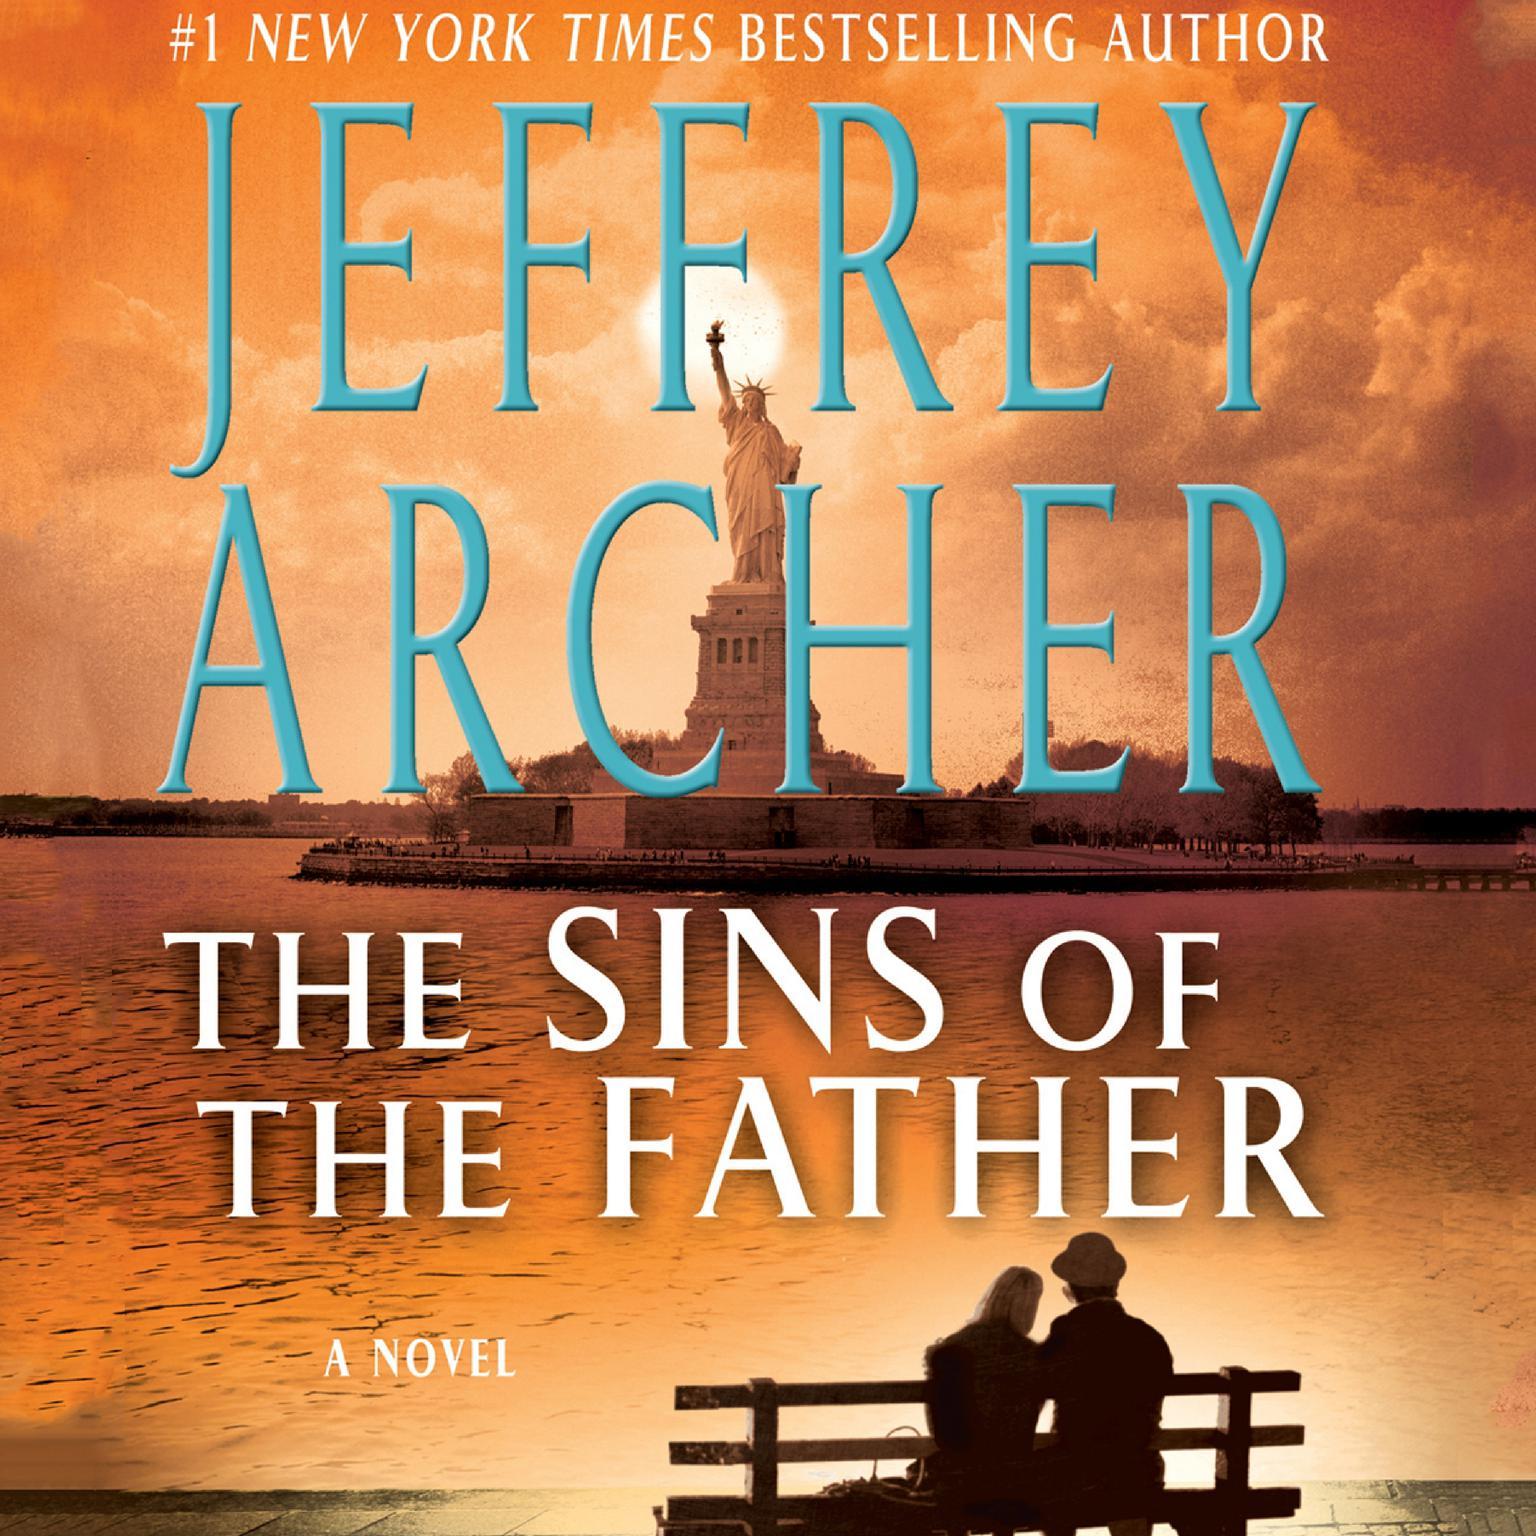 jeffrey archer the sins of the father pdf